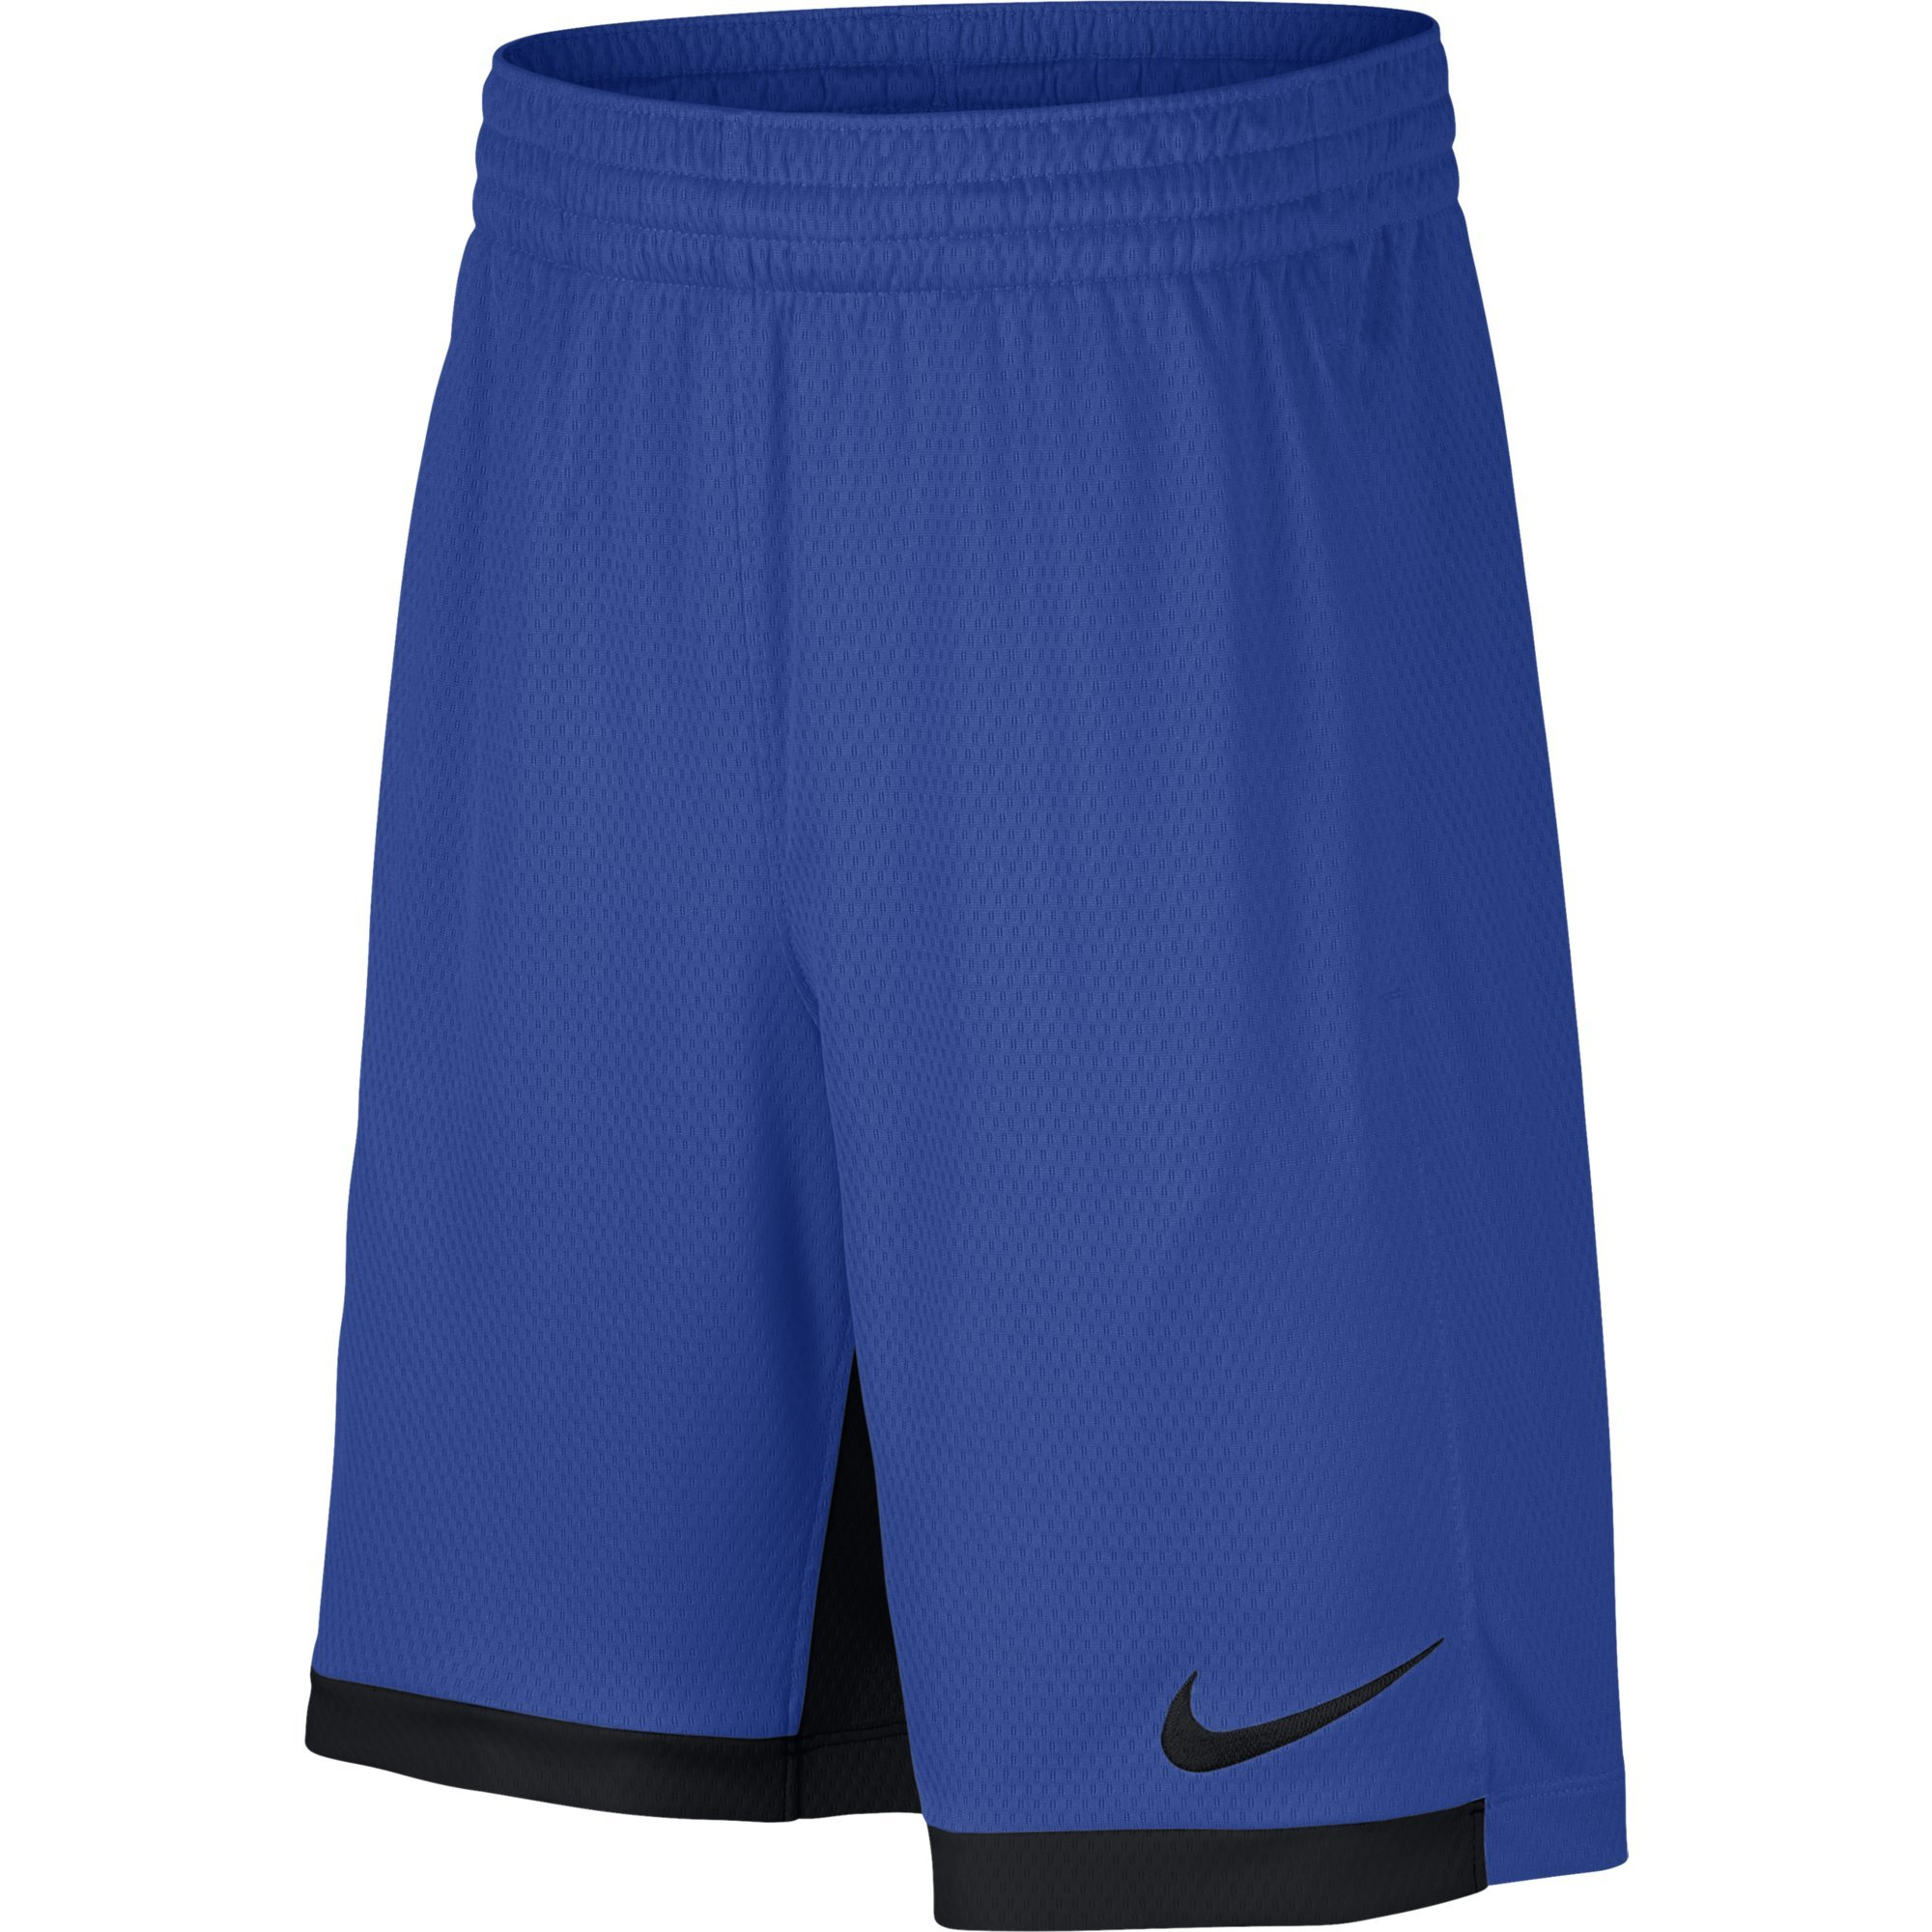 Nike 8'' Dry Short Trophy, Dri-FIT Boys' training shorts, Athletic shorts, Game Royal/Black/Black, L by Nike